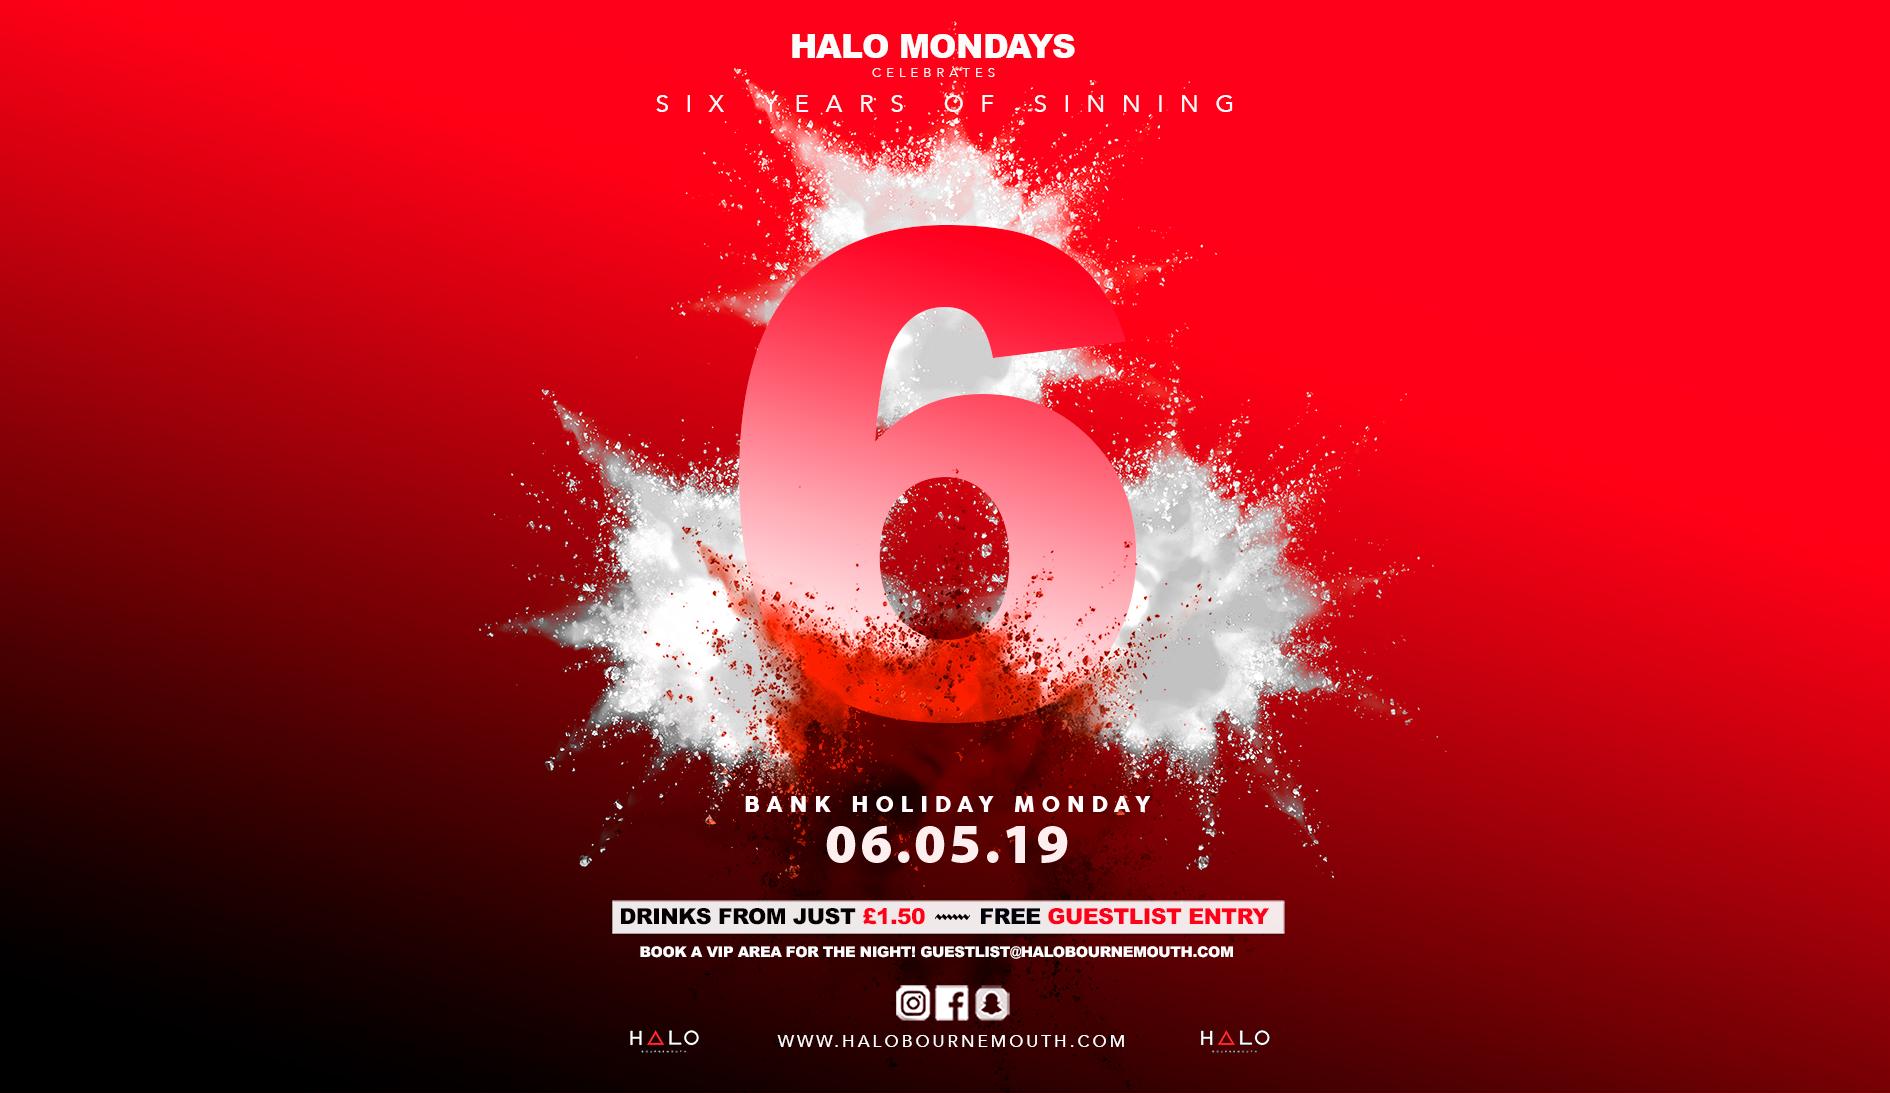 We Are Six 06.05.19 Halo Mondays